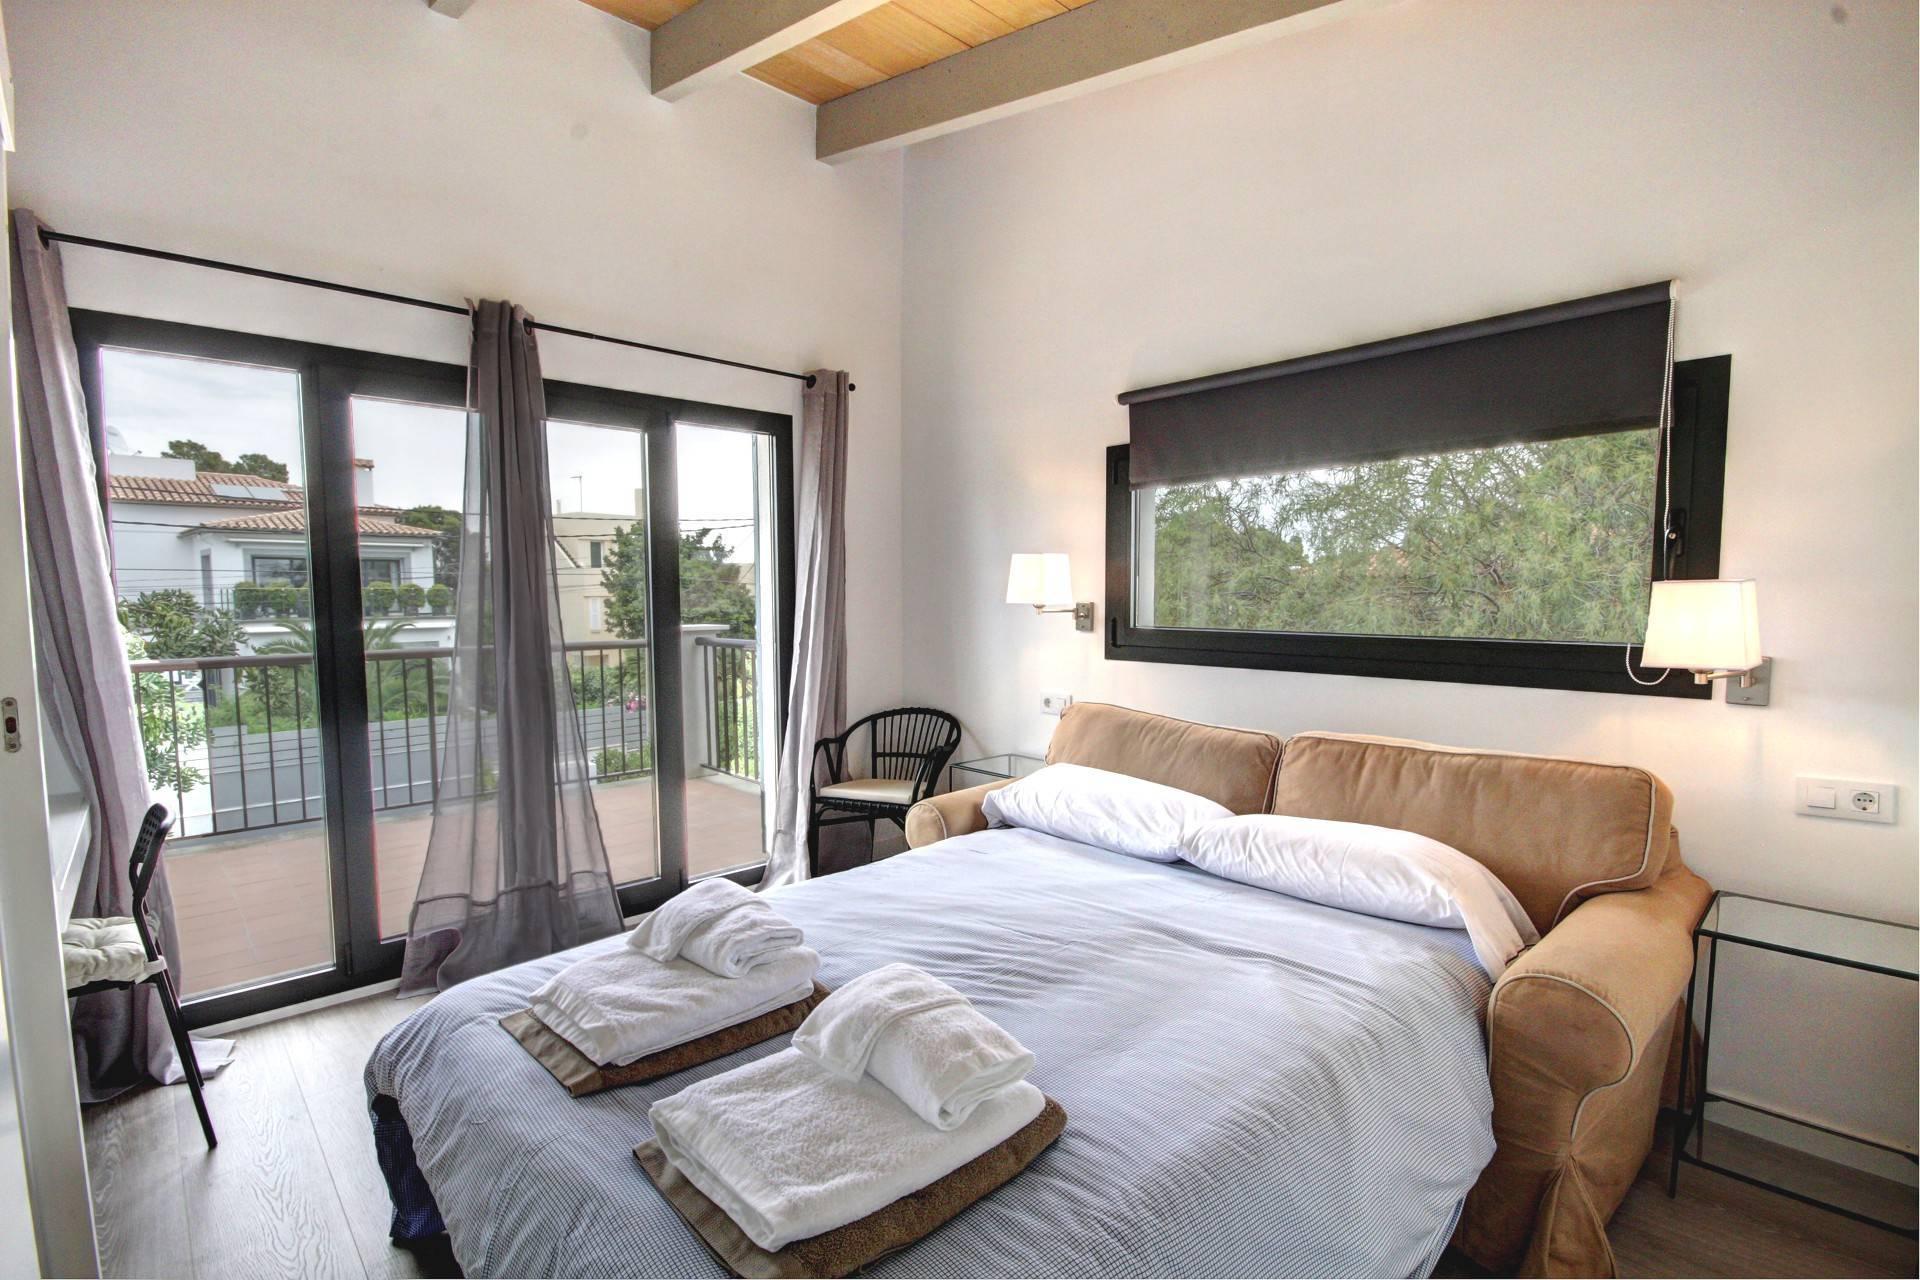 01-264 Modernes Ferienhaus Mallorca Südwesten Bild 17